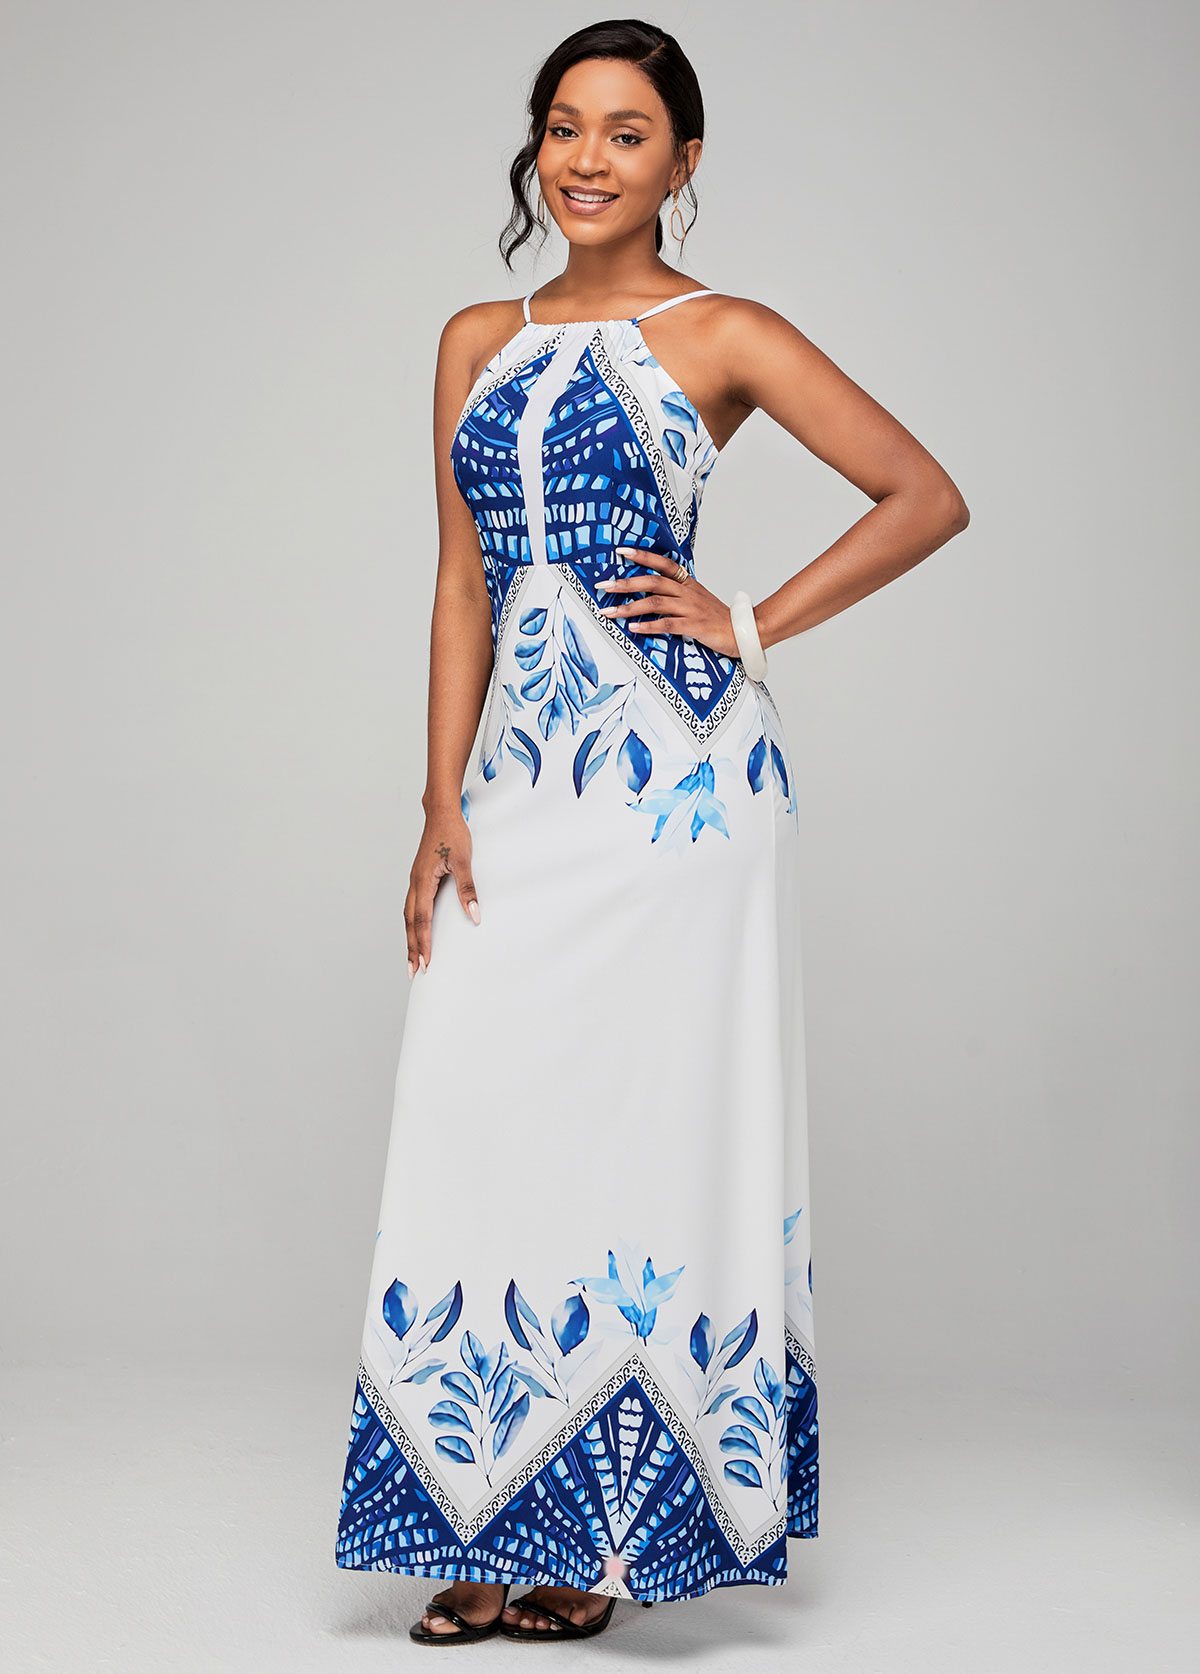 High Waist Tribal Print Spaghetti Strap Dress